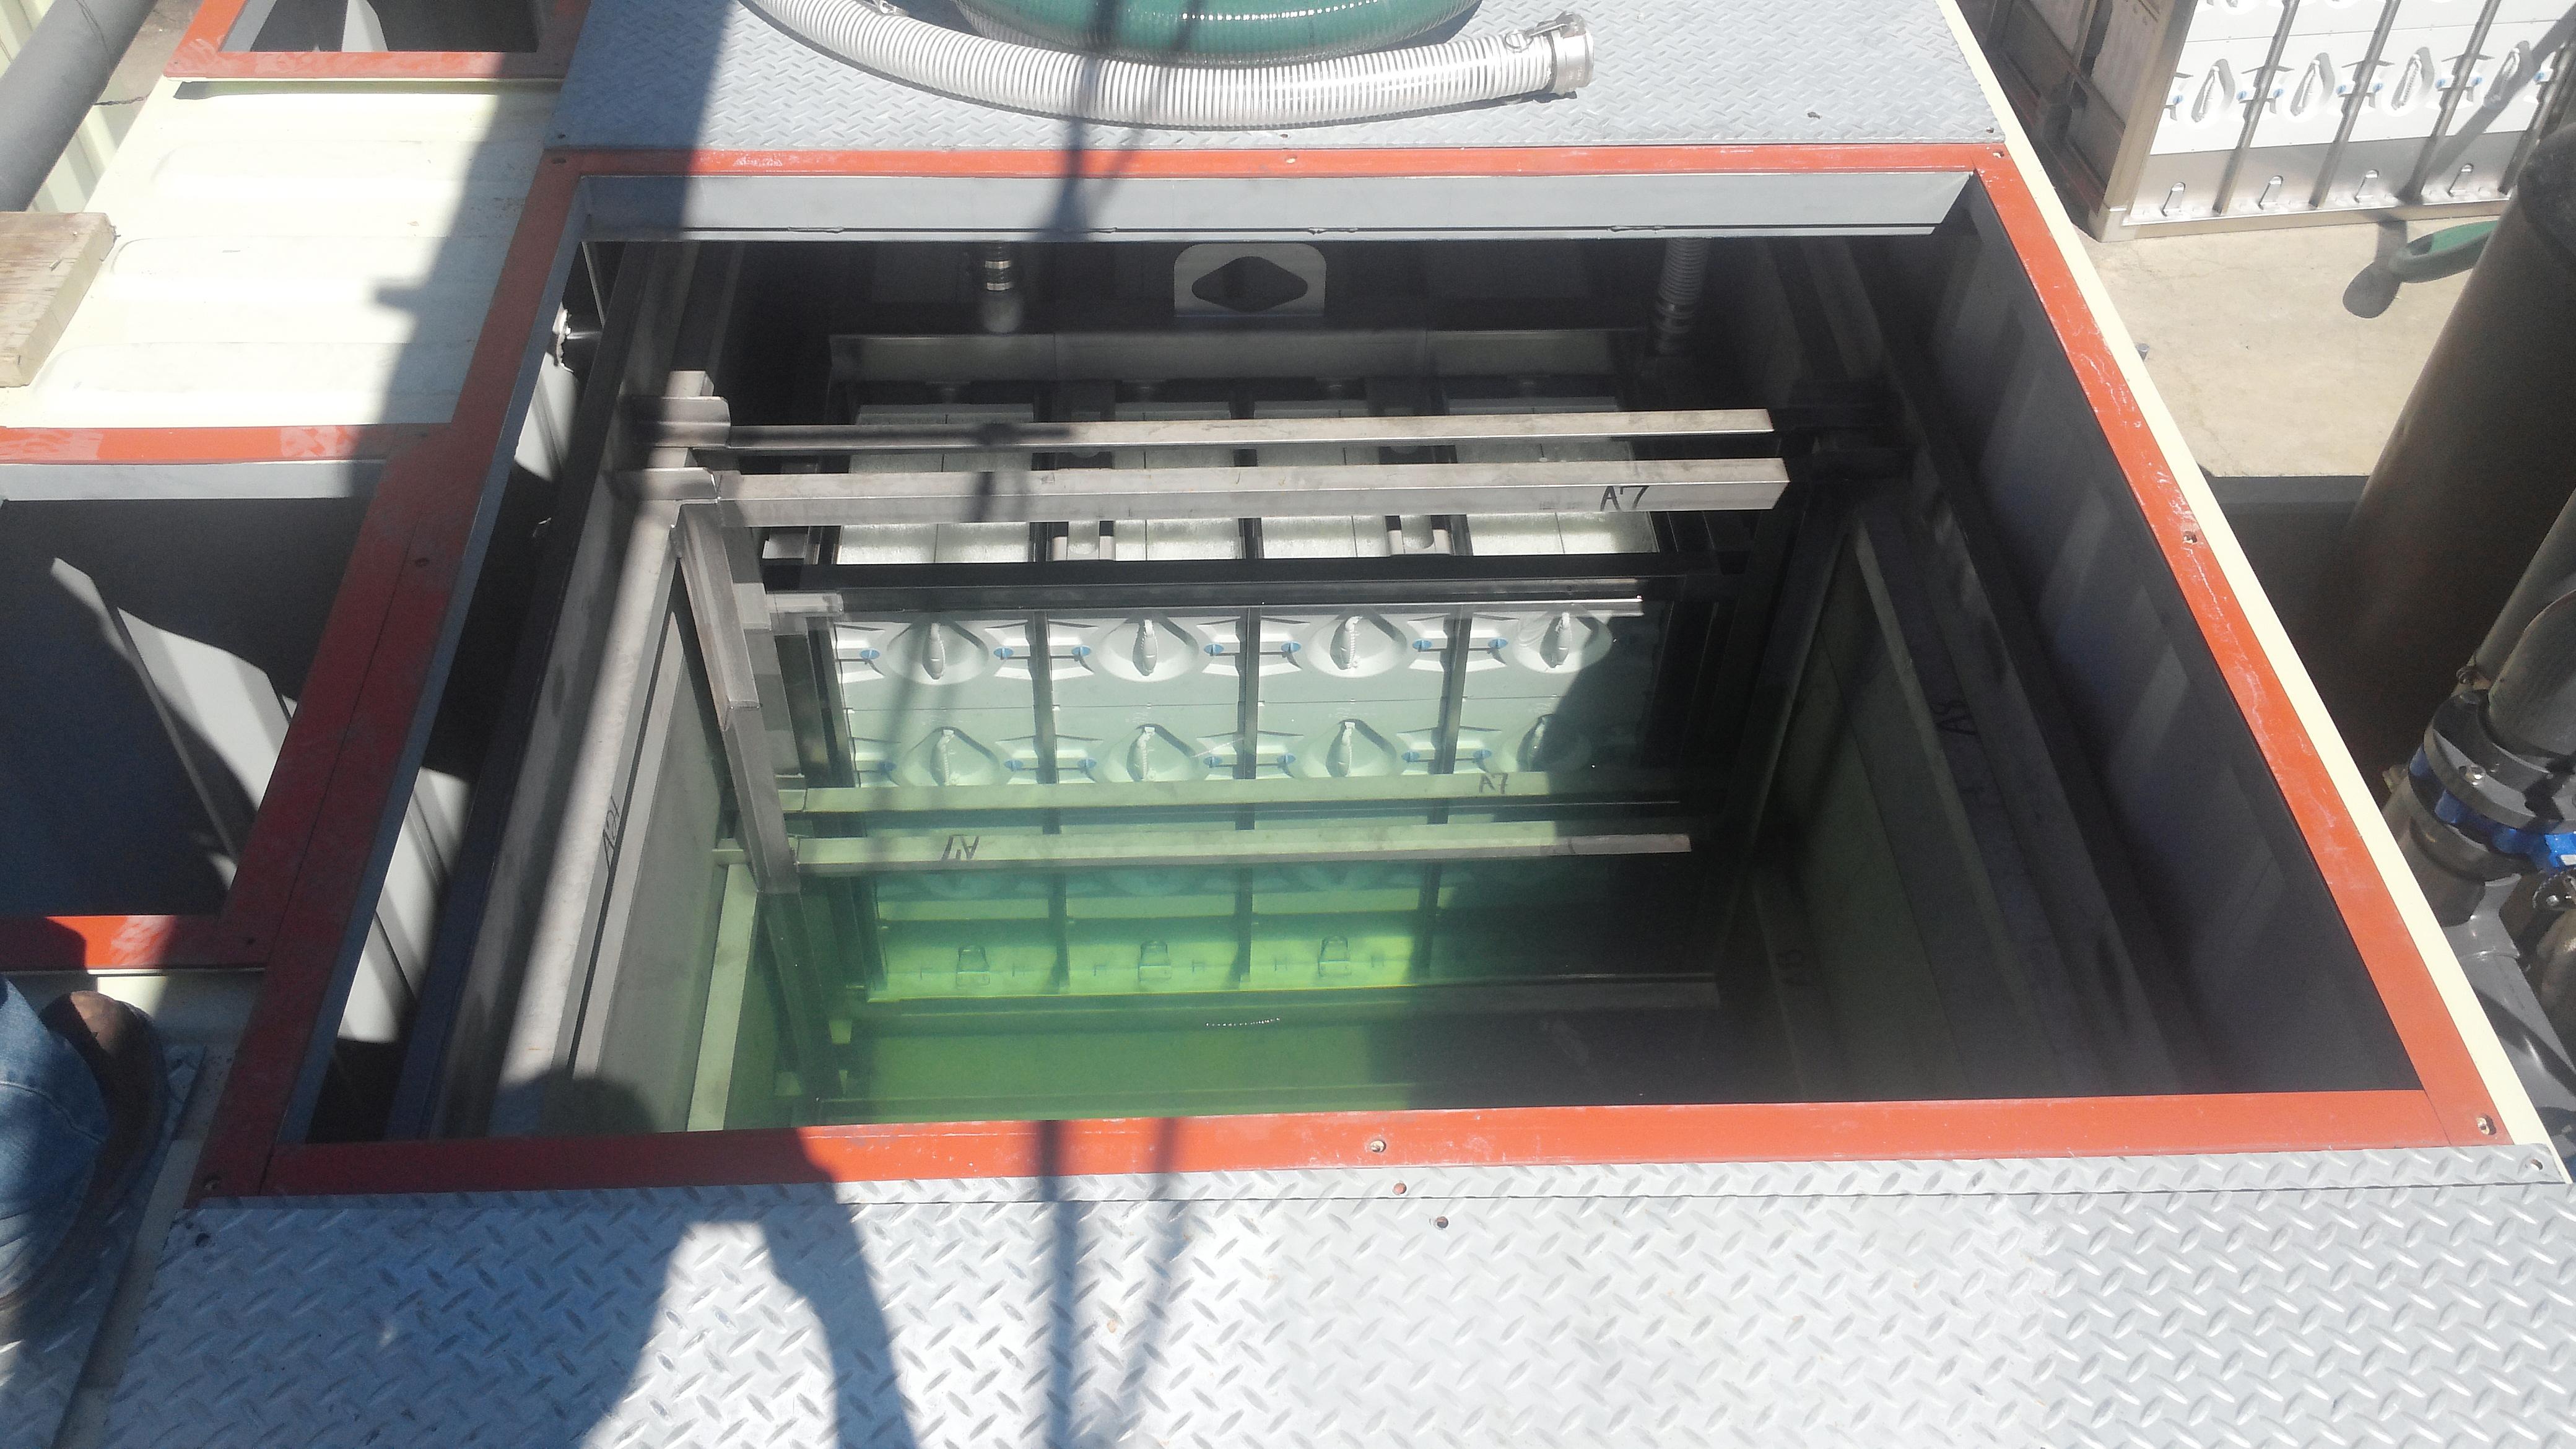 Schwing Bioset Membrane Bioreactors